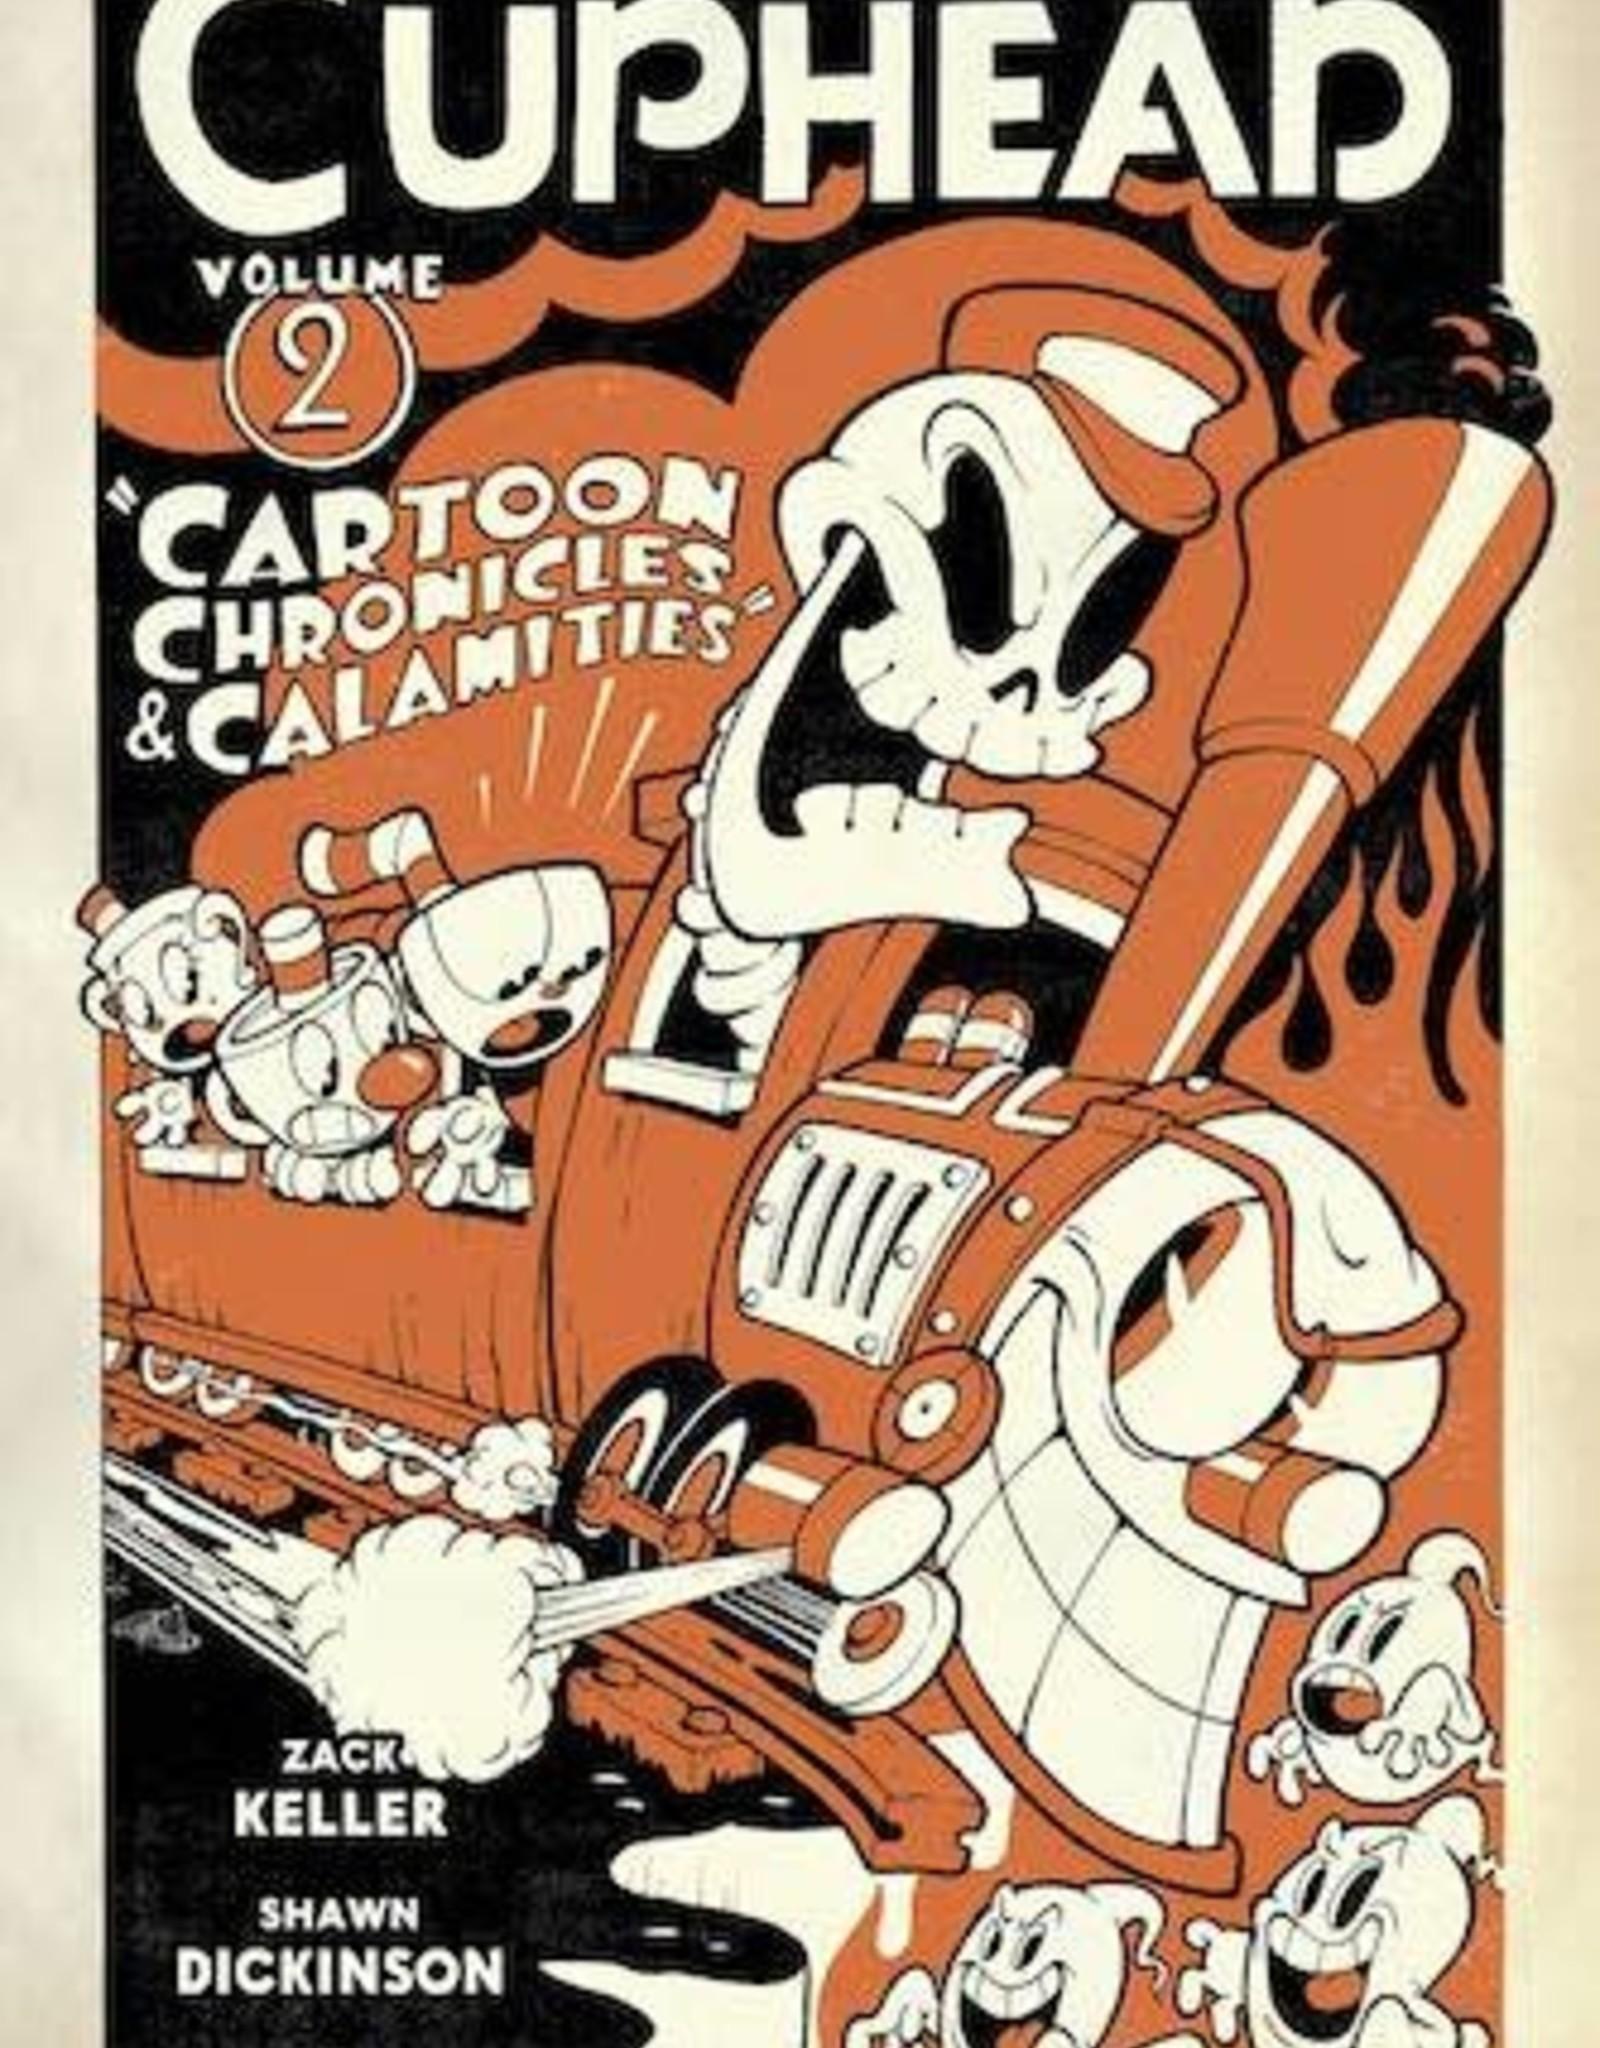 Dark Horse Comics Cuphead TP Vol 02 Cartoon Chronicles & Calamities